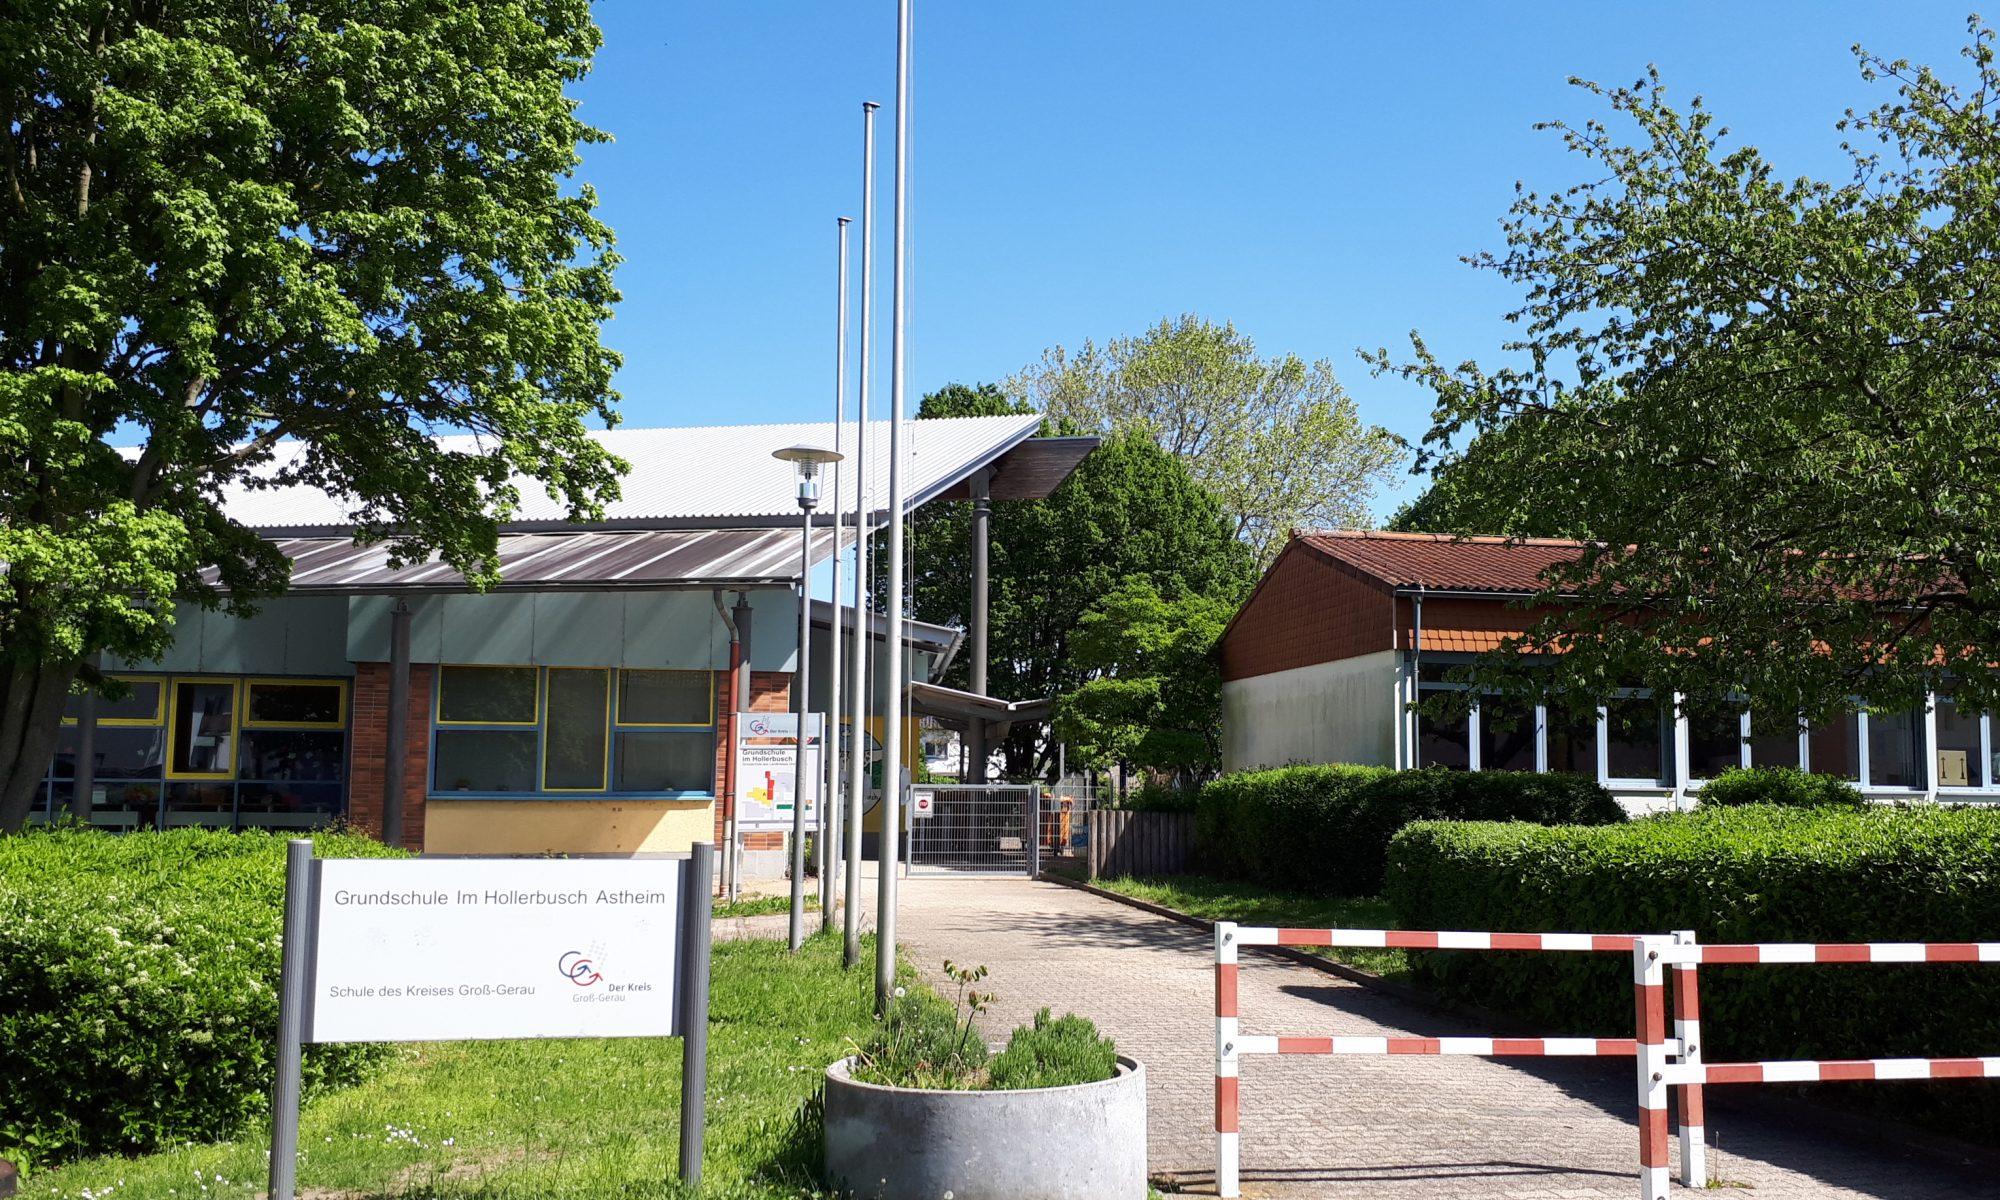 Grundschule im Hollerbusch